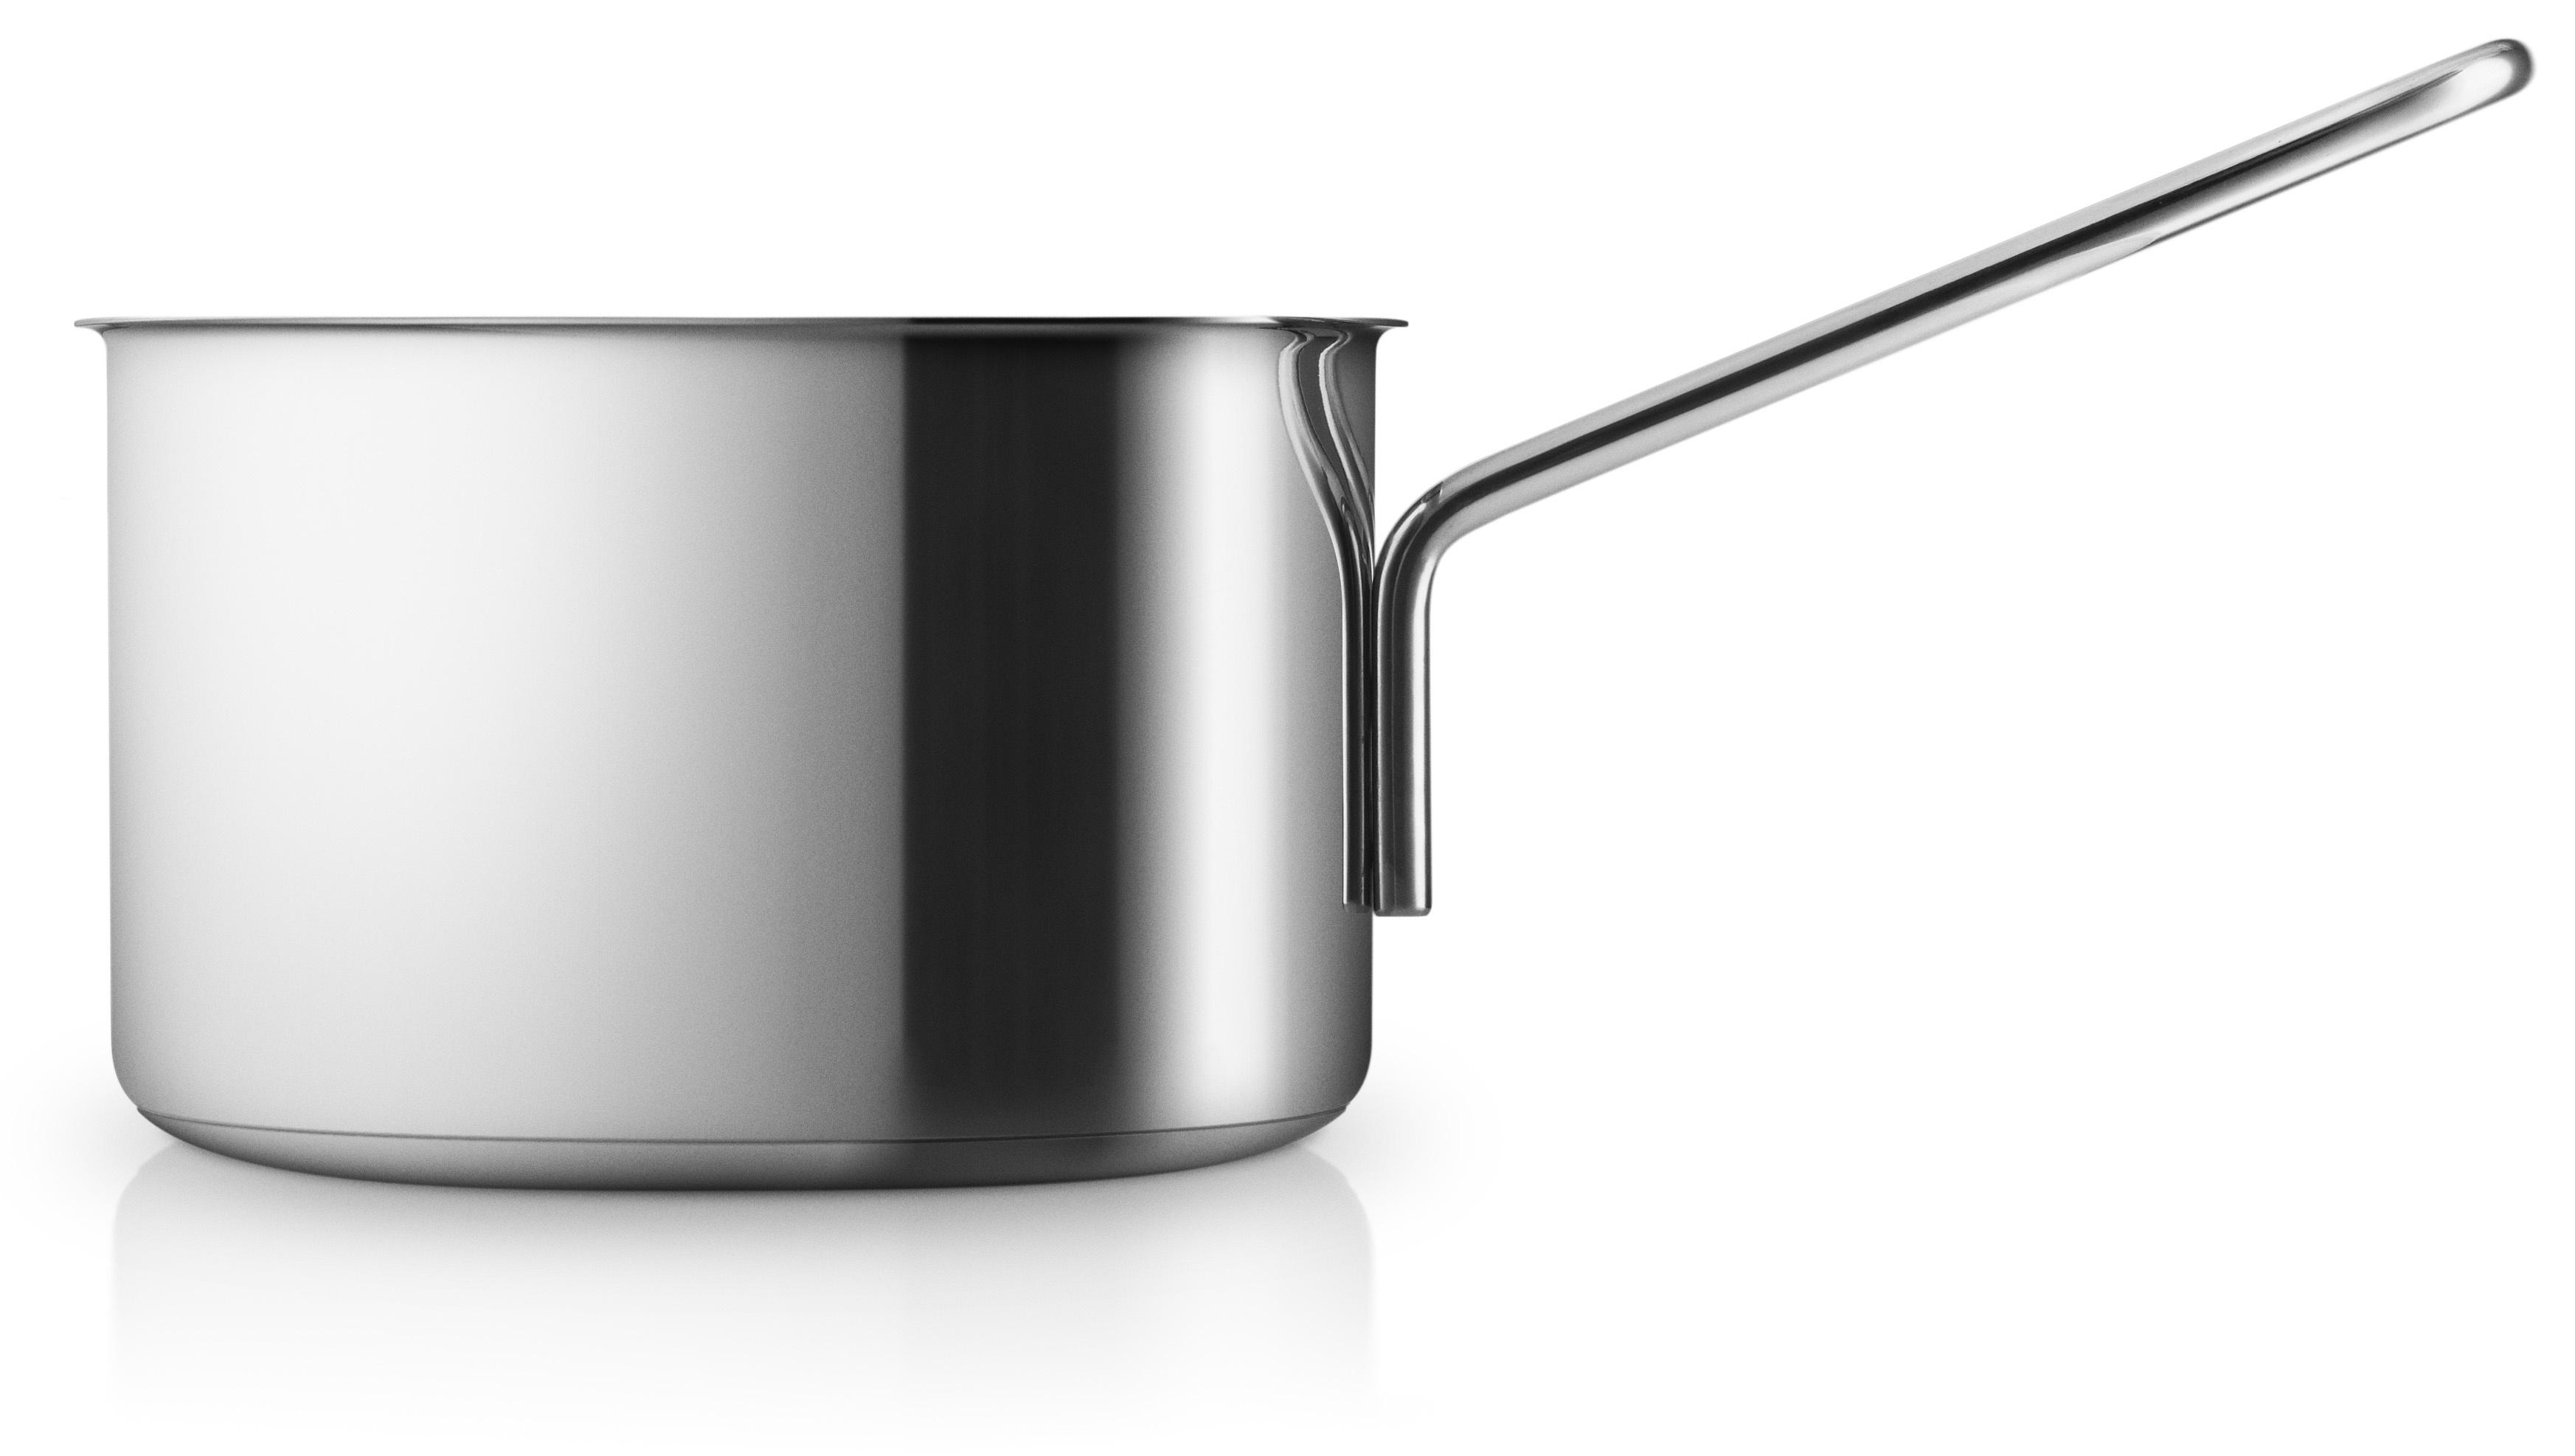 Eva Trio Rustfri stål kasserolle, 1,8 liter